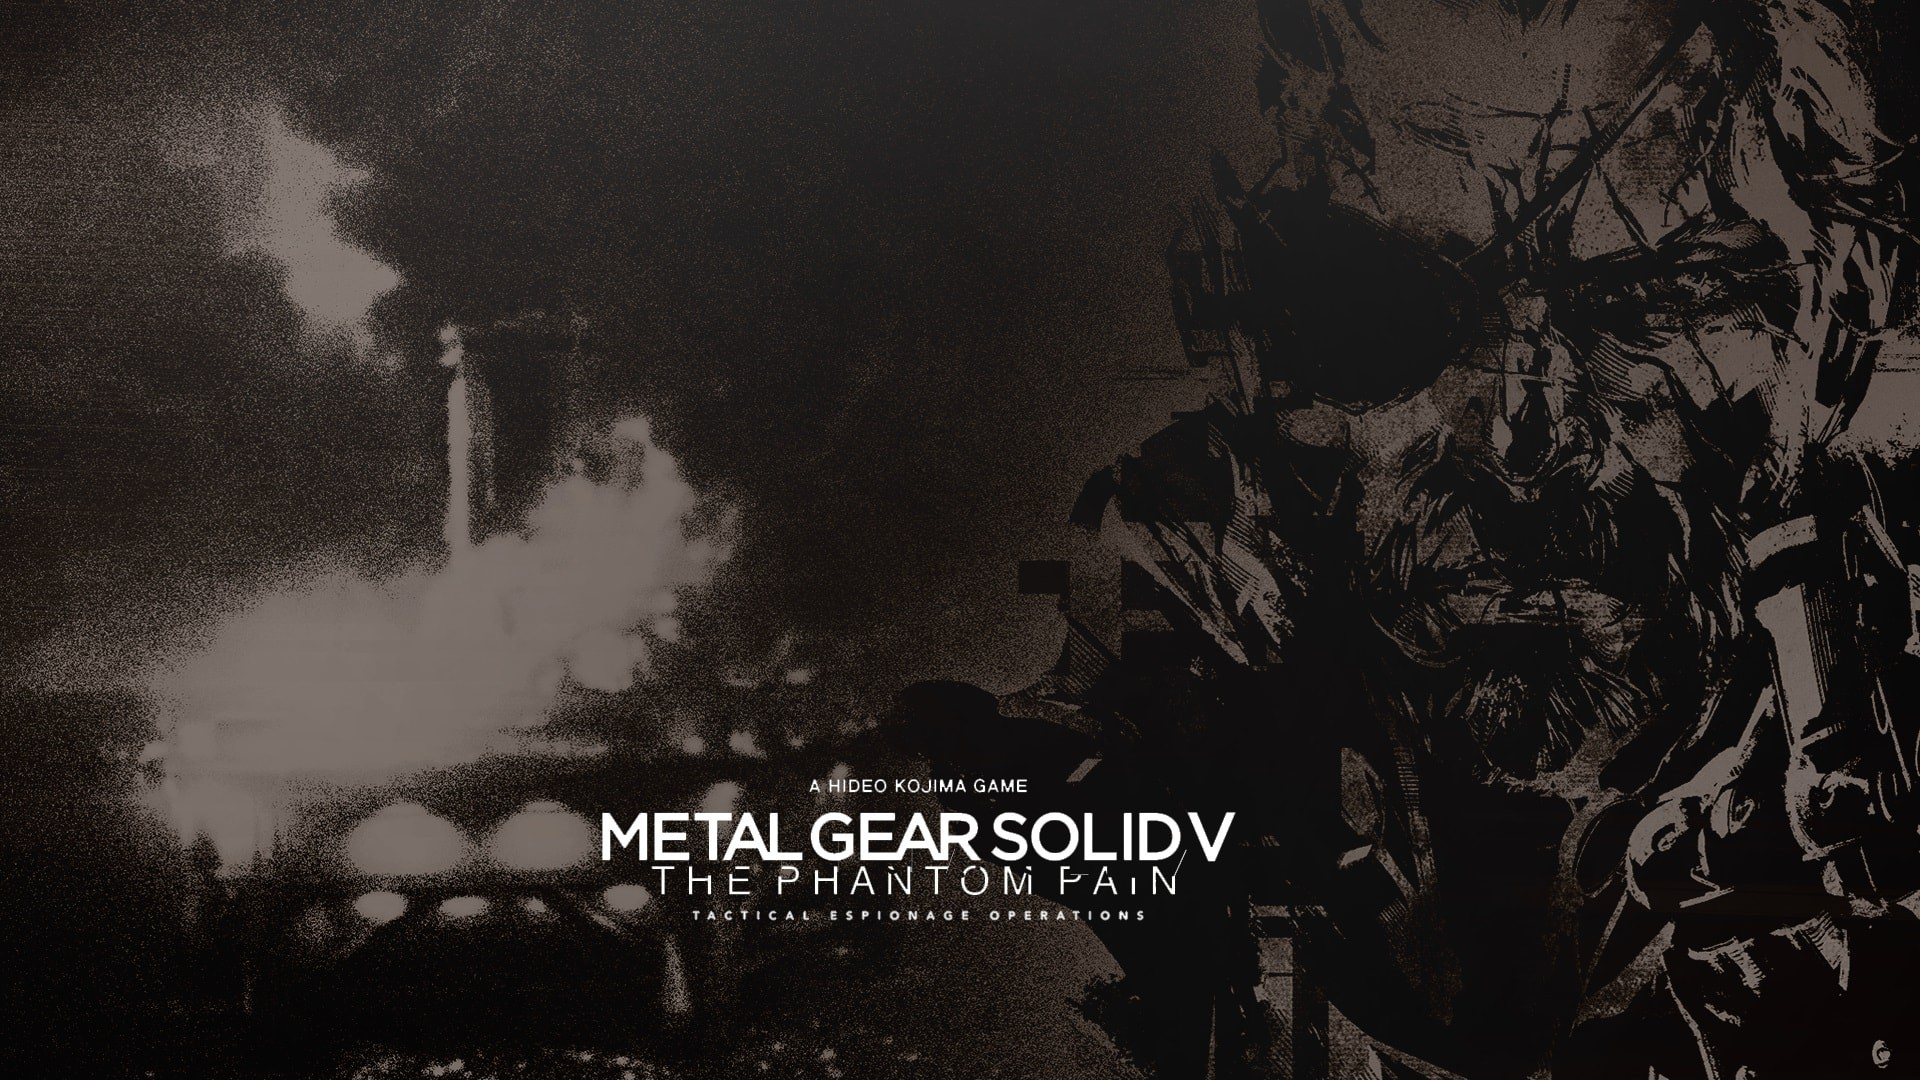 … Metal Gear Solid V: The Phantom Pain Wallpapers hd